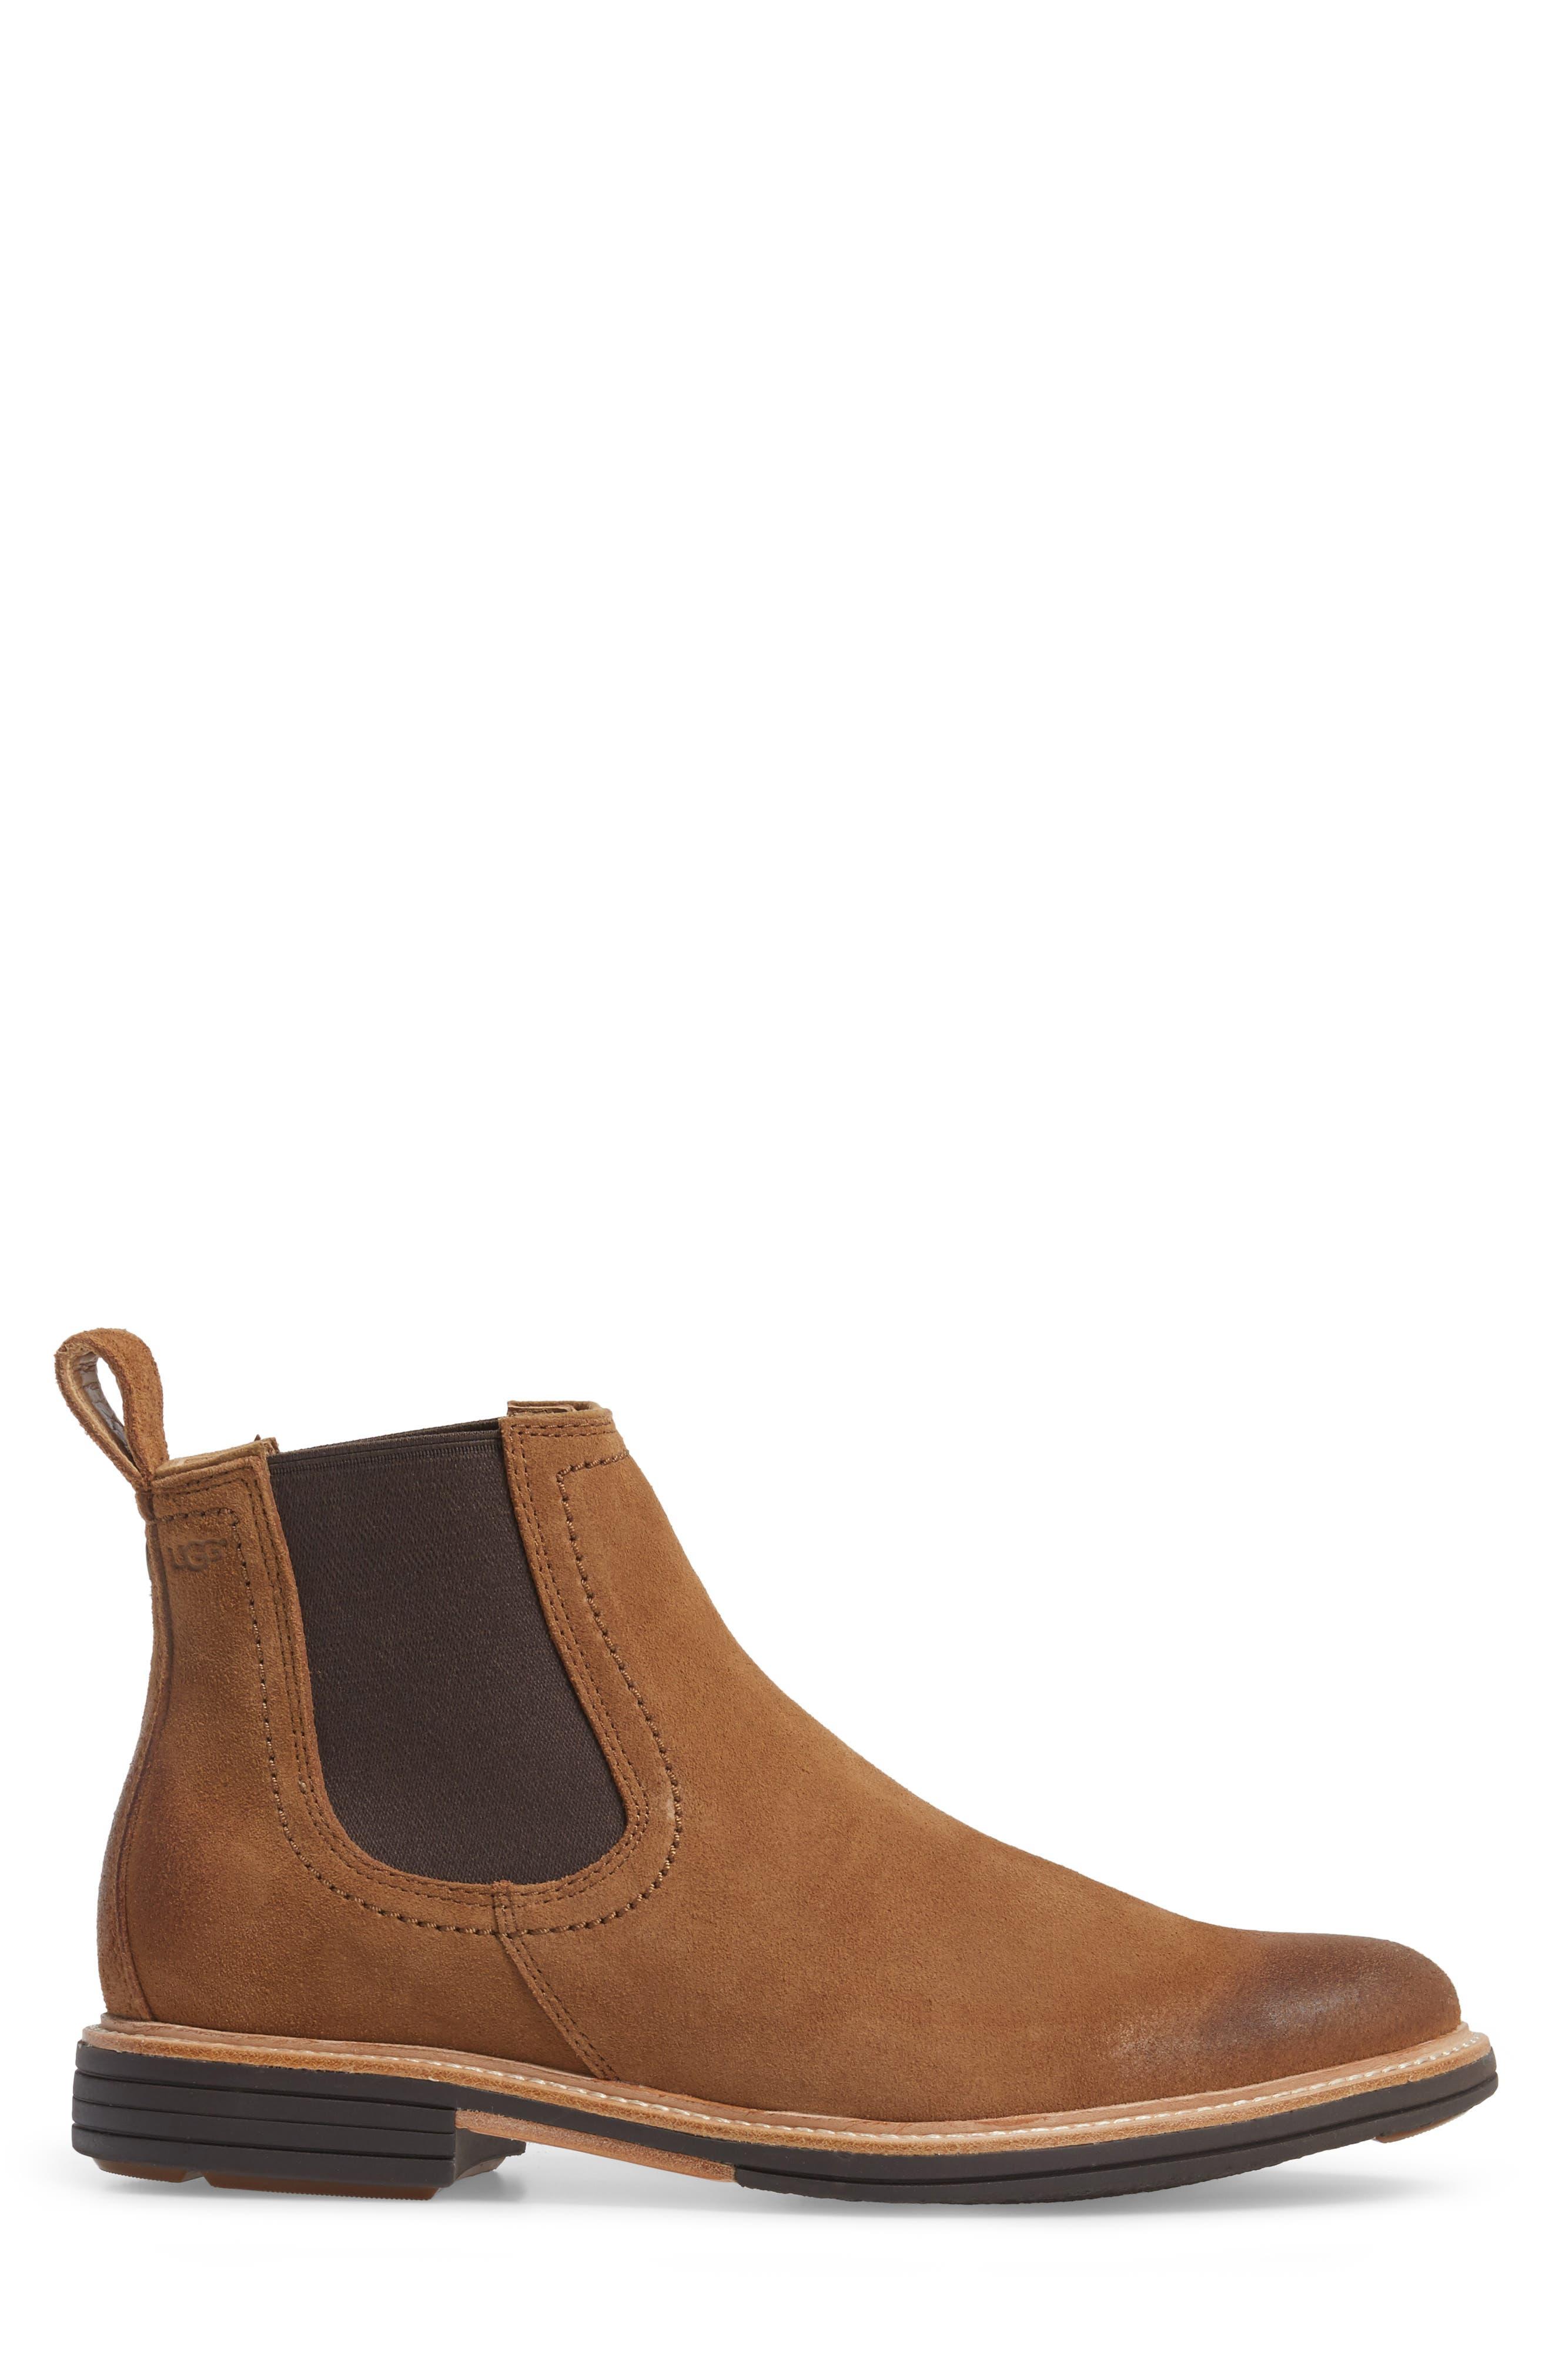 Alternate Image 3  - UGG® Baldvin Chelsea Boot (Men)